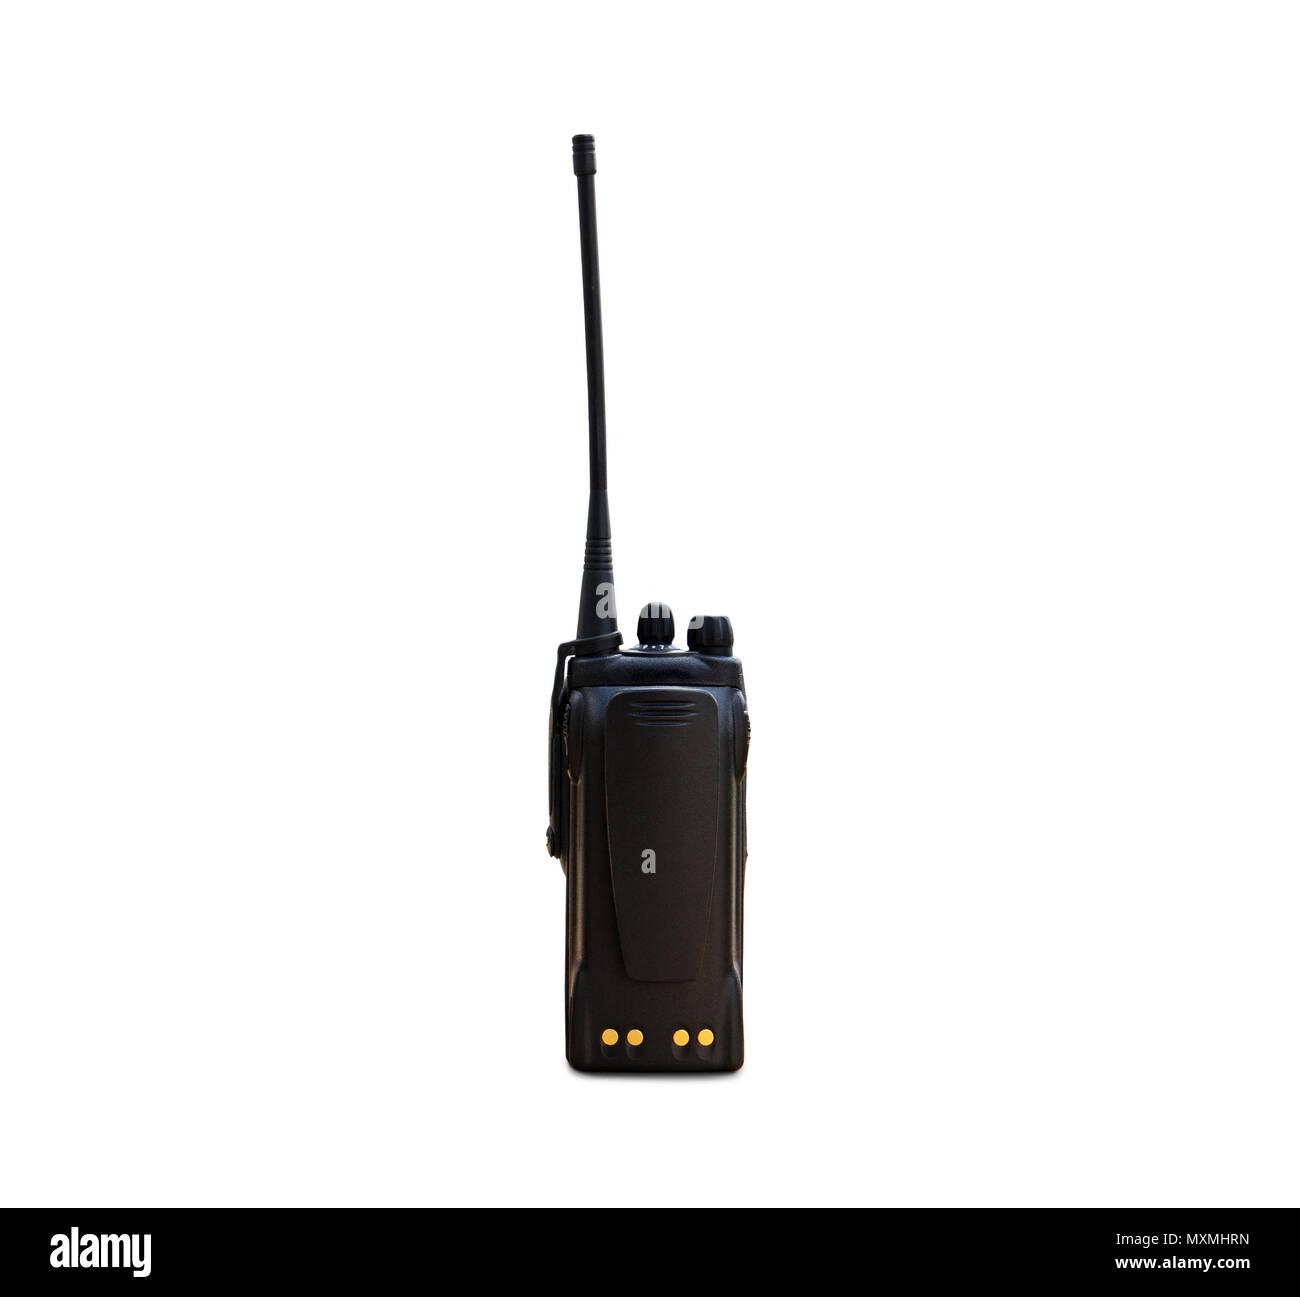 how to talk on radio walkie talkie